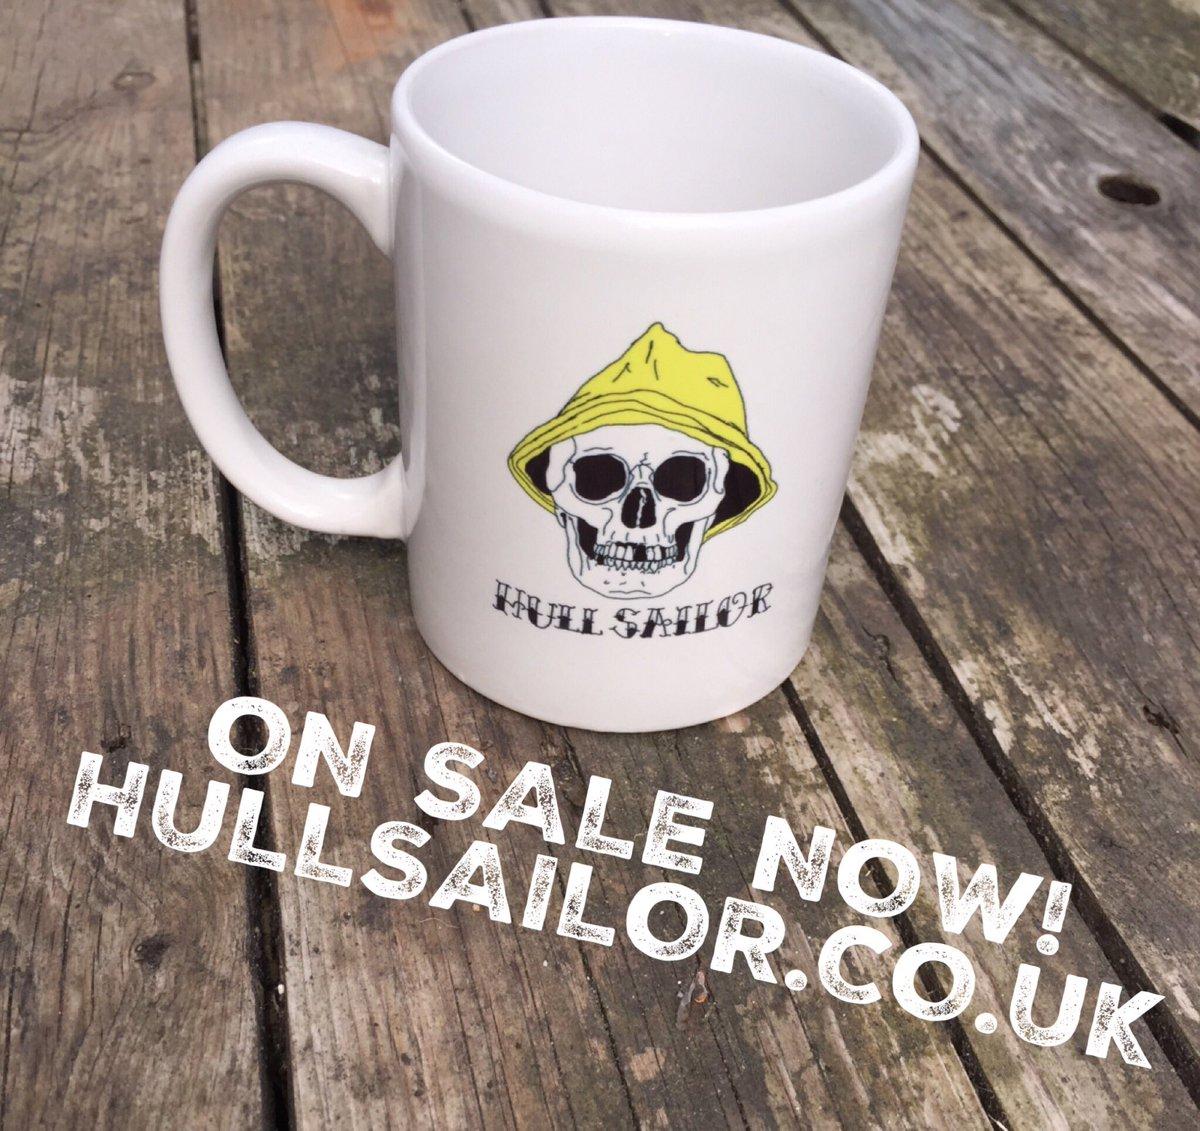 Hull Sailor mugs available now at  http:// HULLSAILOR.CO.UK  &nbsp;   #hull2017 #fisher #pirate #pinup #SkullandBones<br>http://pic.twitter.com/hsOXM29YuS